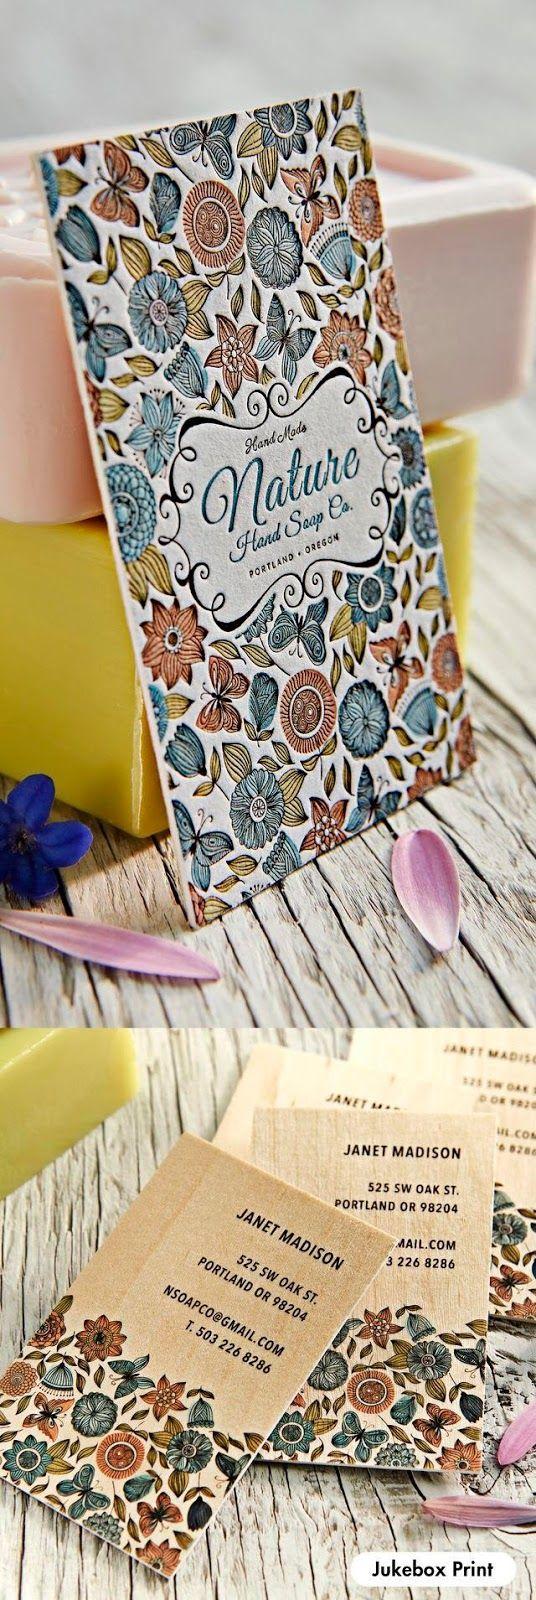 Lettering Time: Las mejores tarjetas de visita en letterpress